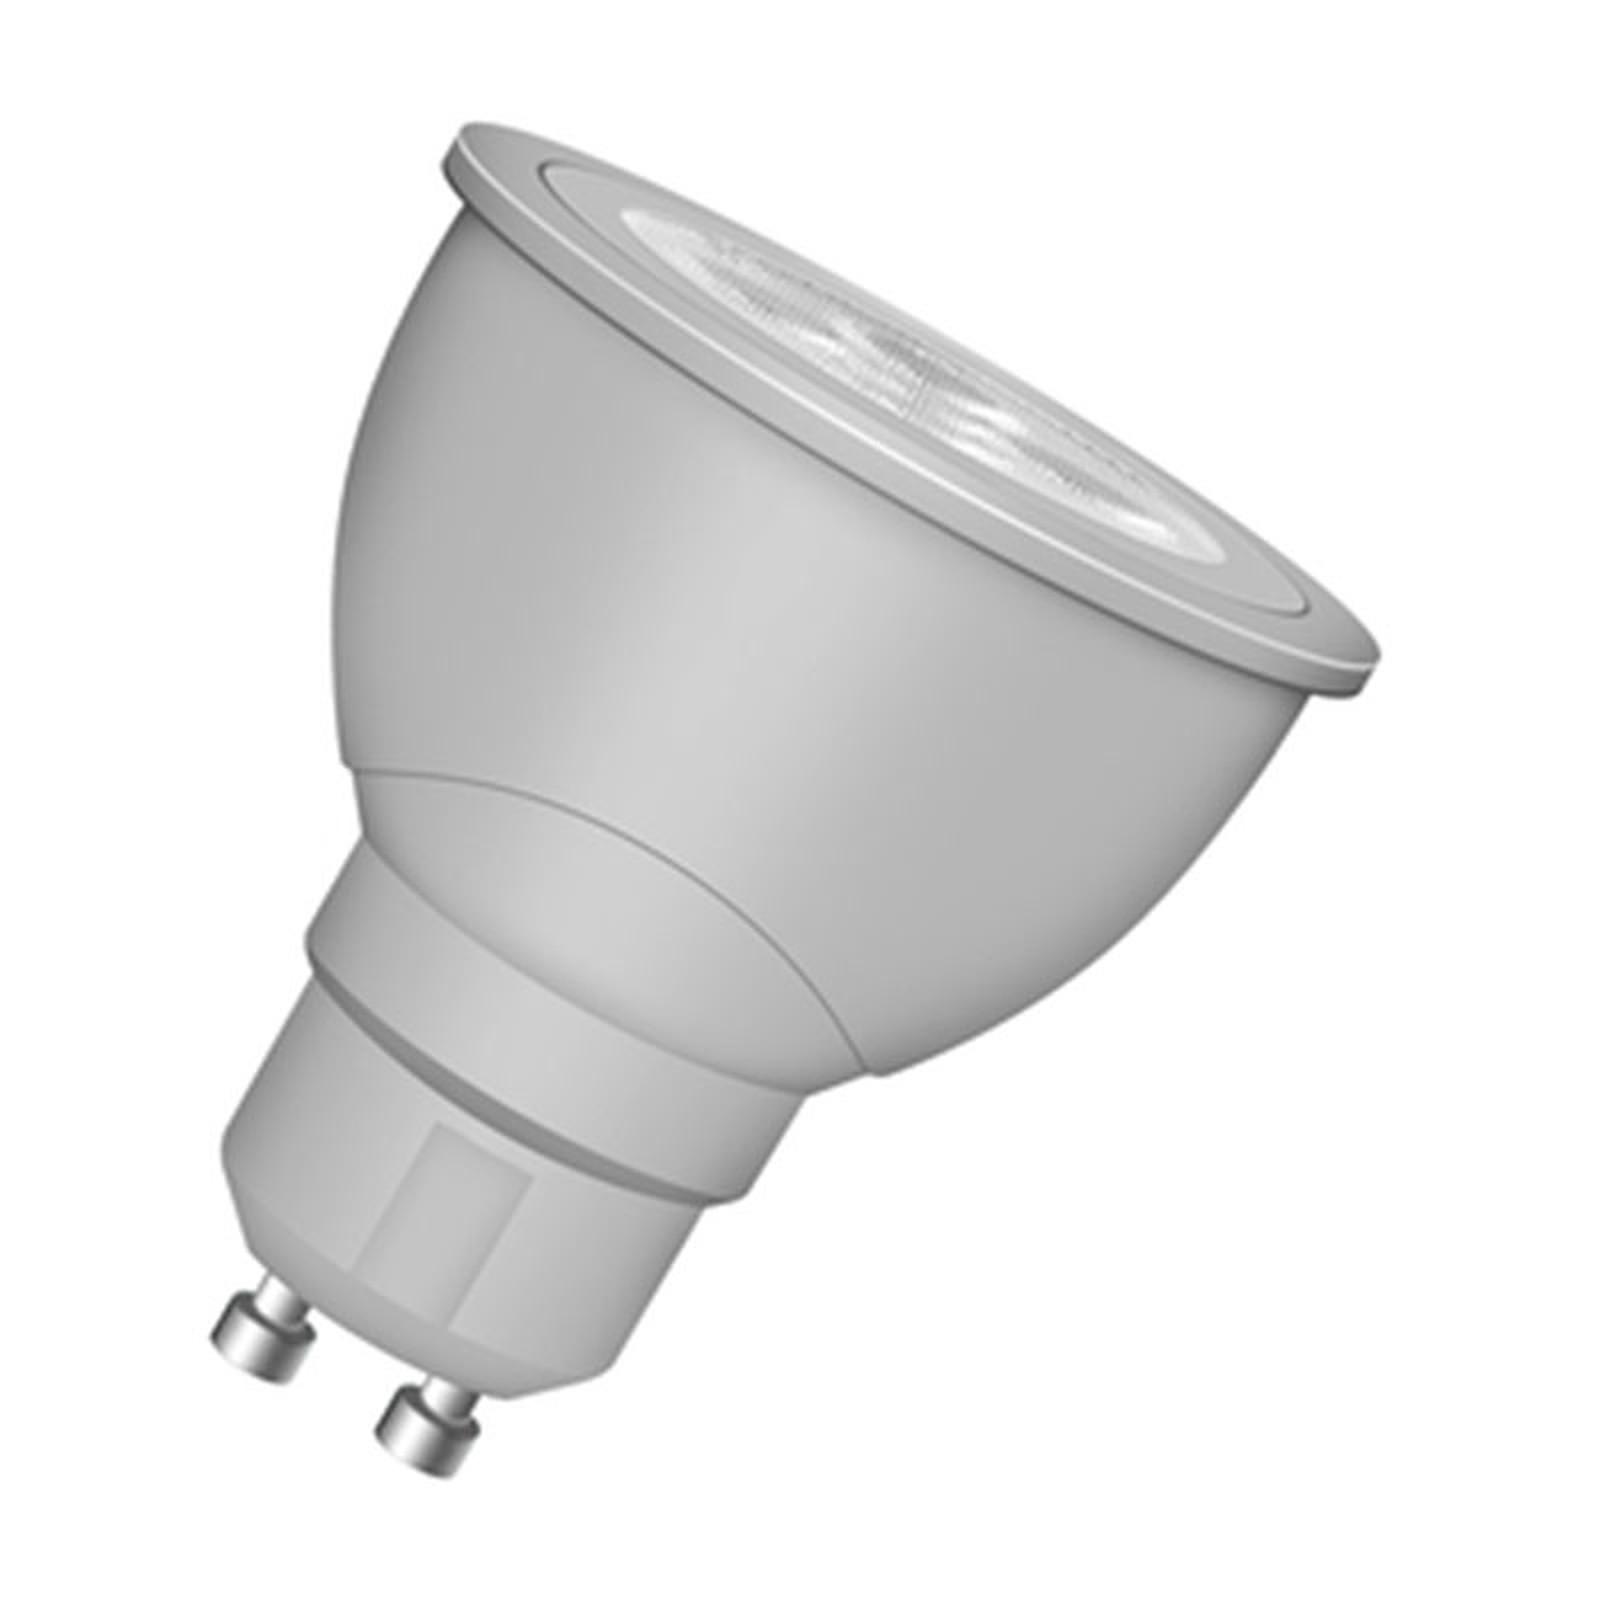 OSRAM Ampoule LED Star spot GU10 3W (35W) A+